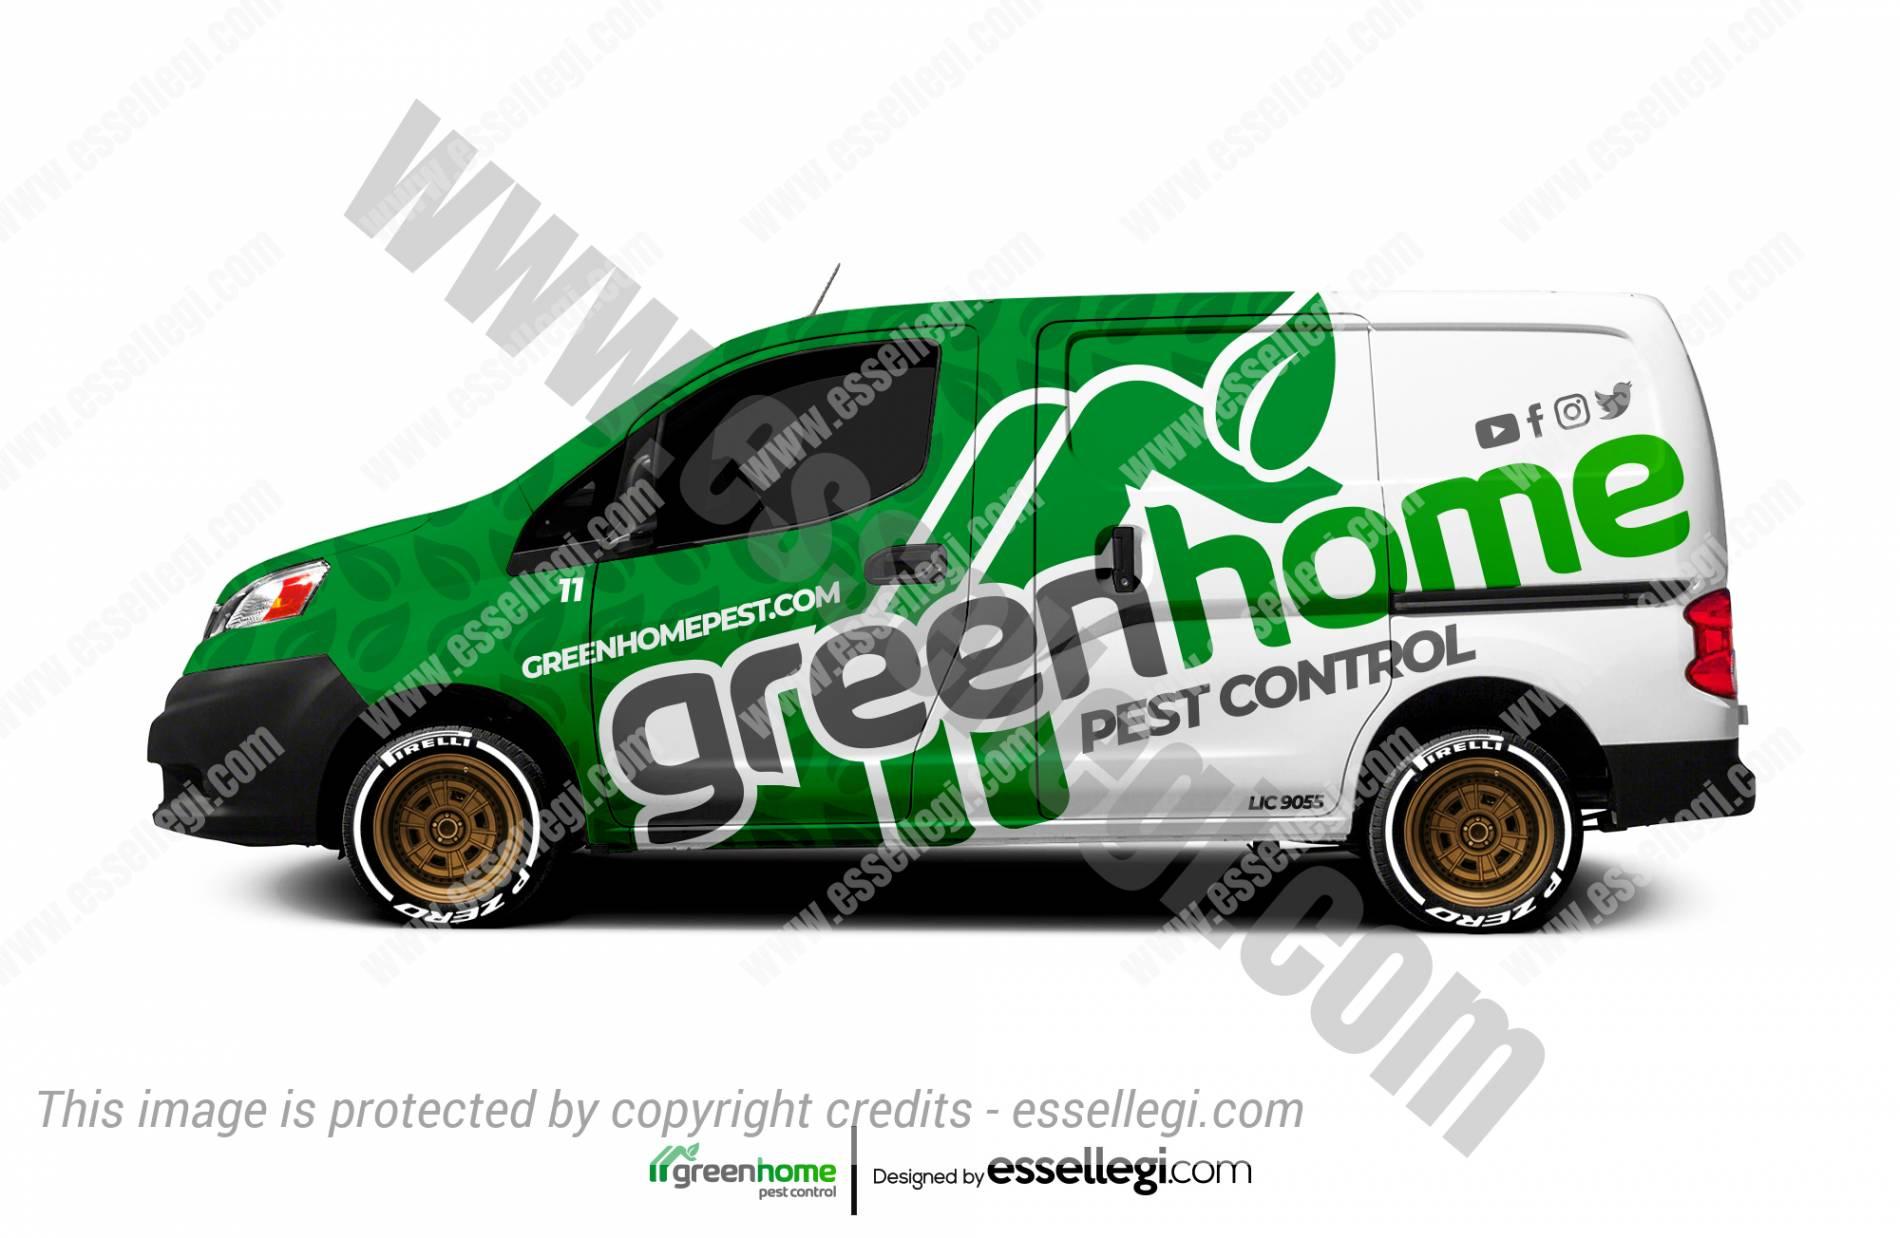 GREEN HOME PEST CONTROL | VAN WRAP DESIGN 🇺🇸